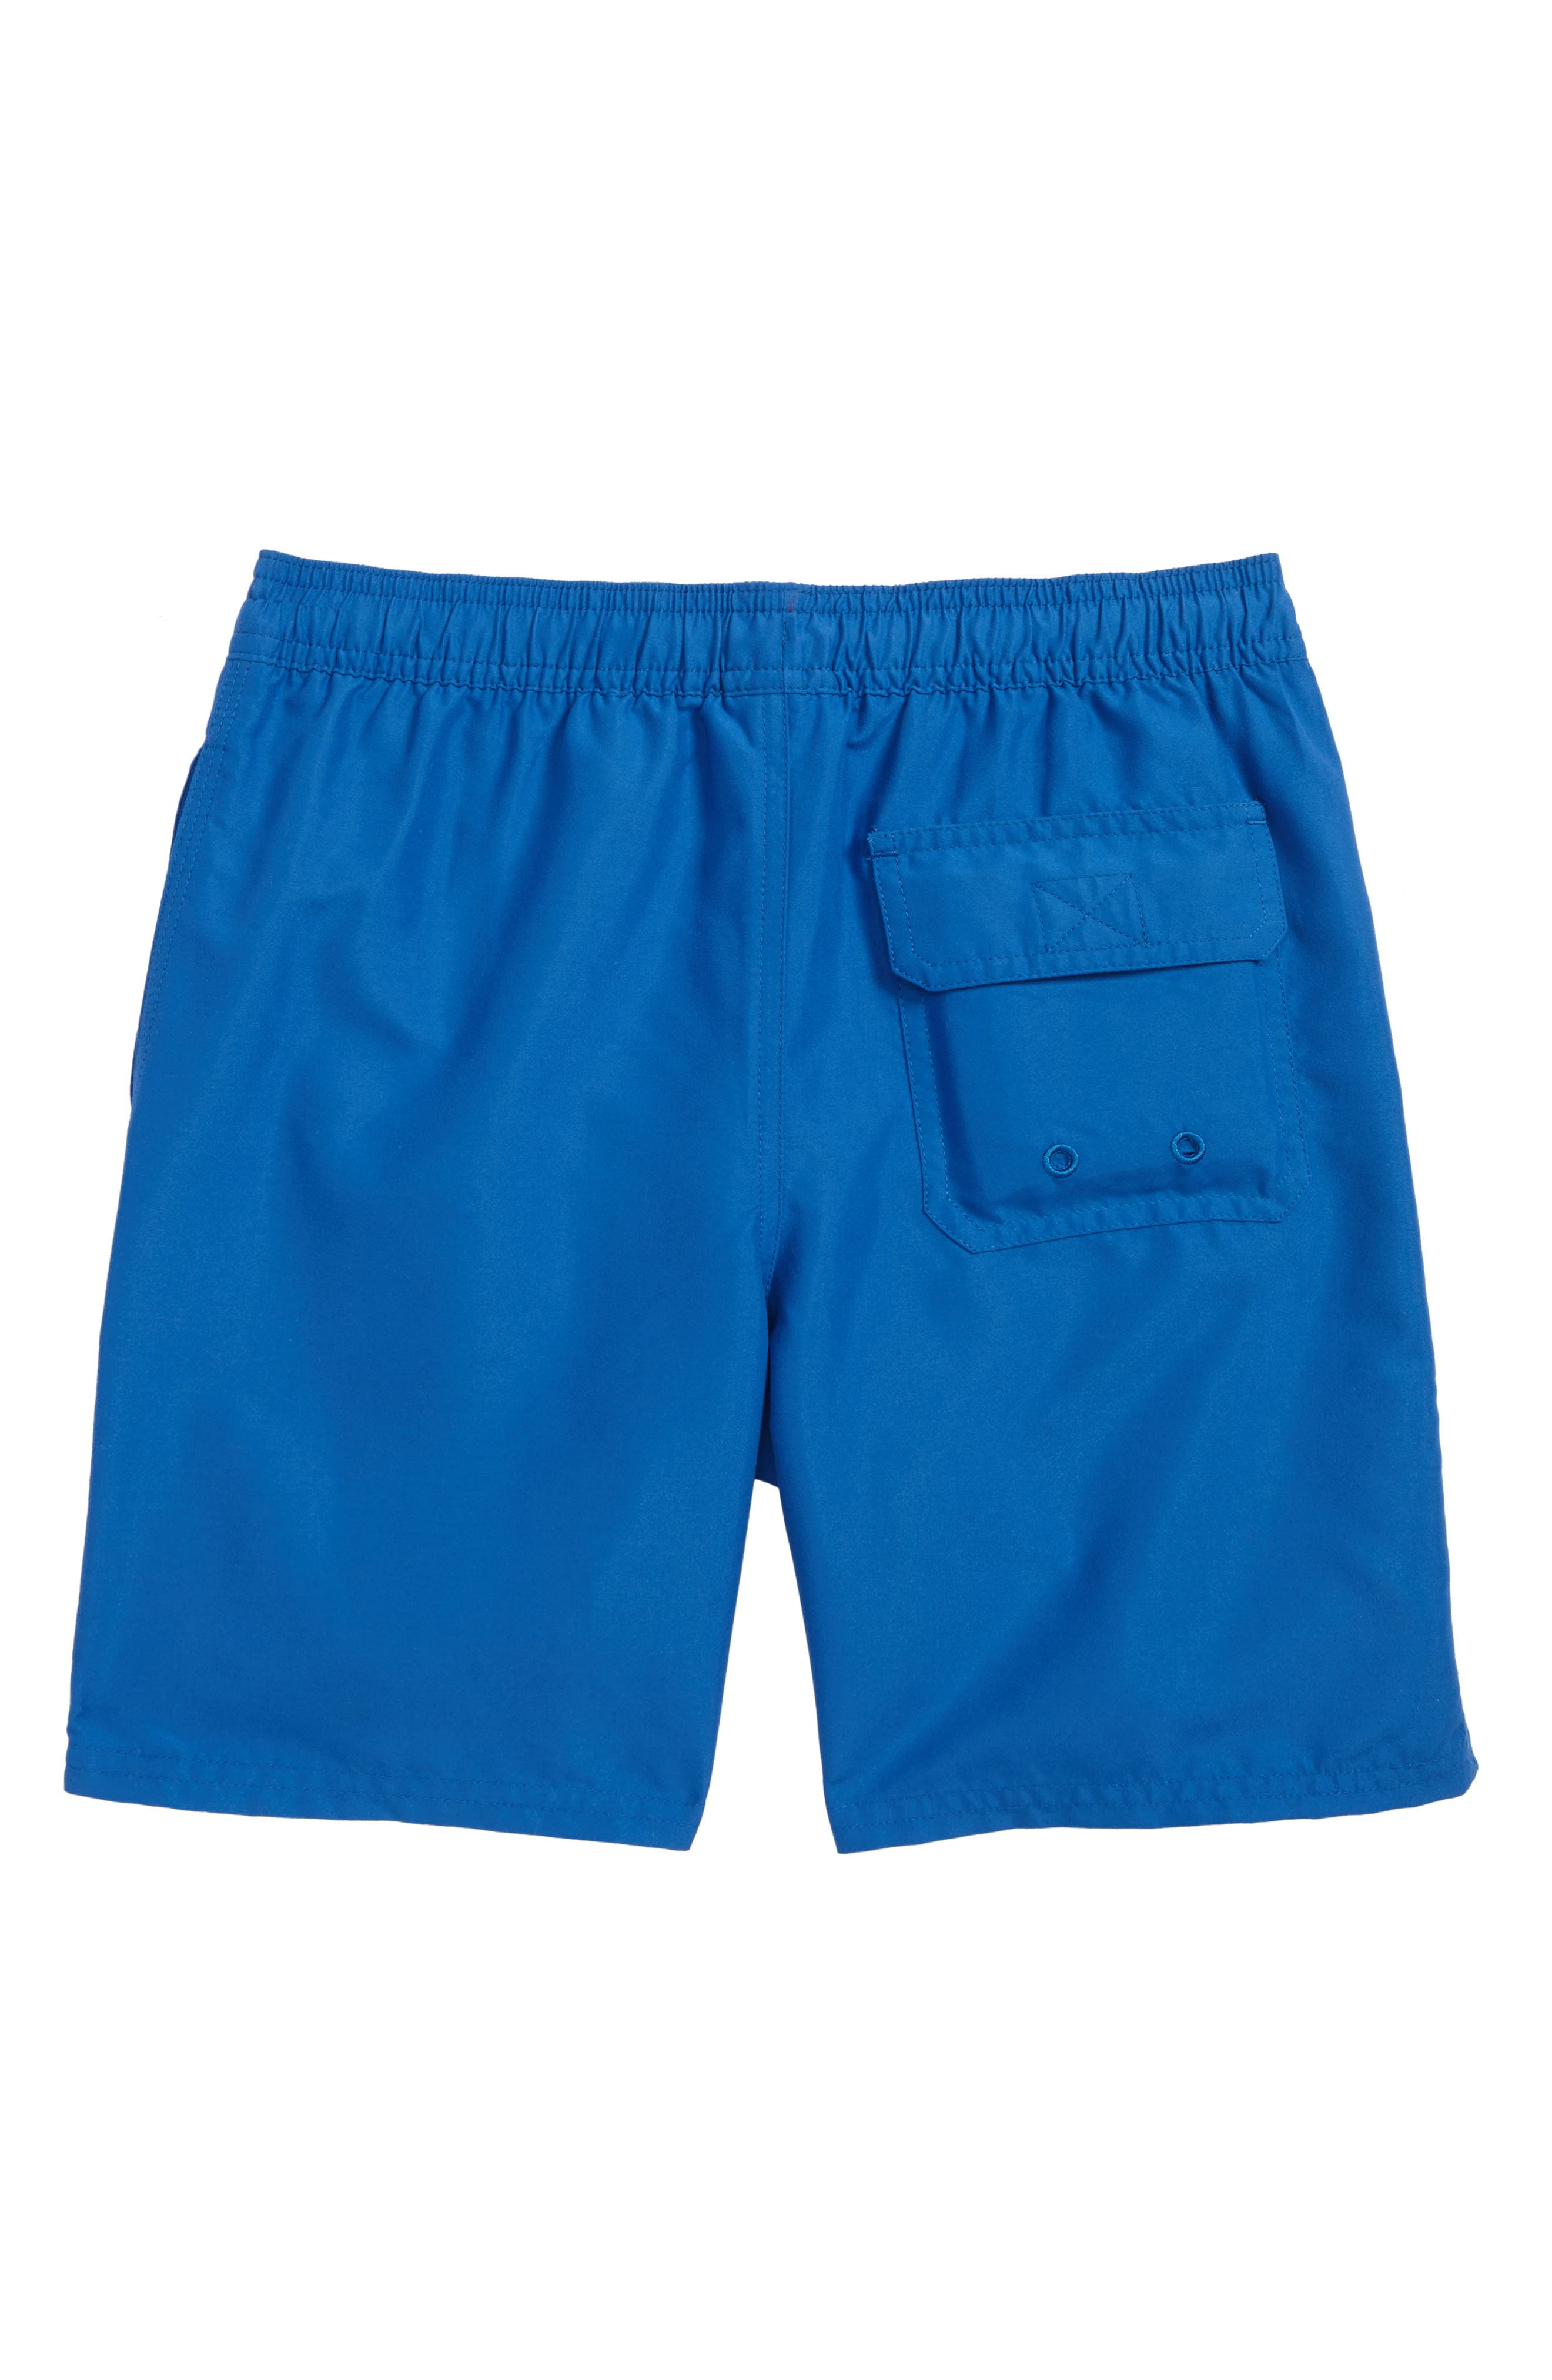 Alternate Image 2  - Vineyard Vines Bungalow Board Shorts (Big Boys)